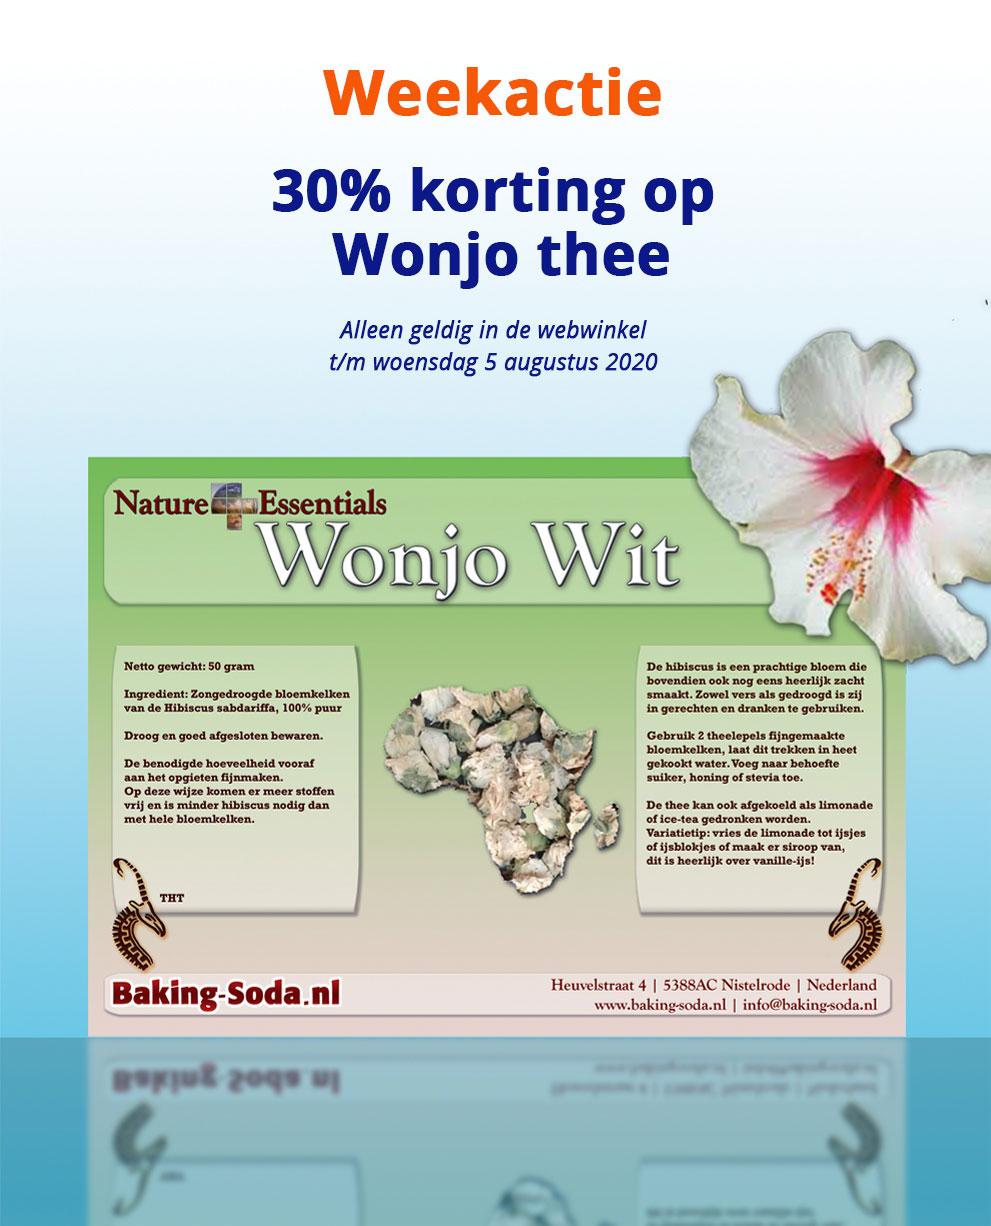 Weekactie-wonjothee-wit-augustus2020-bakingsoda-nl